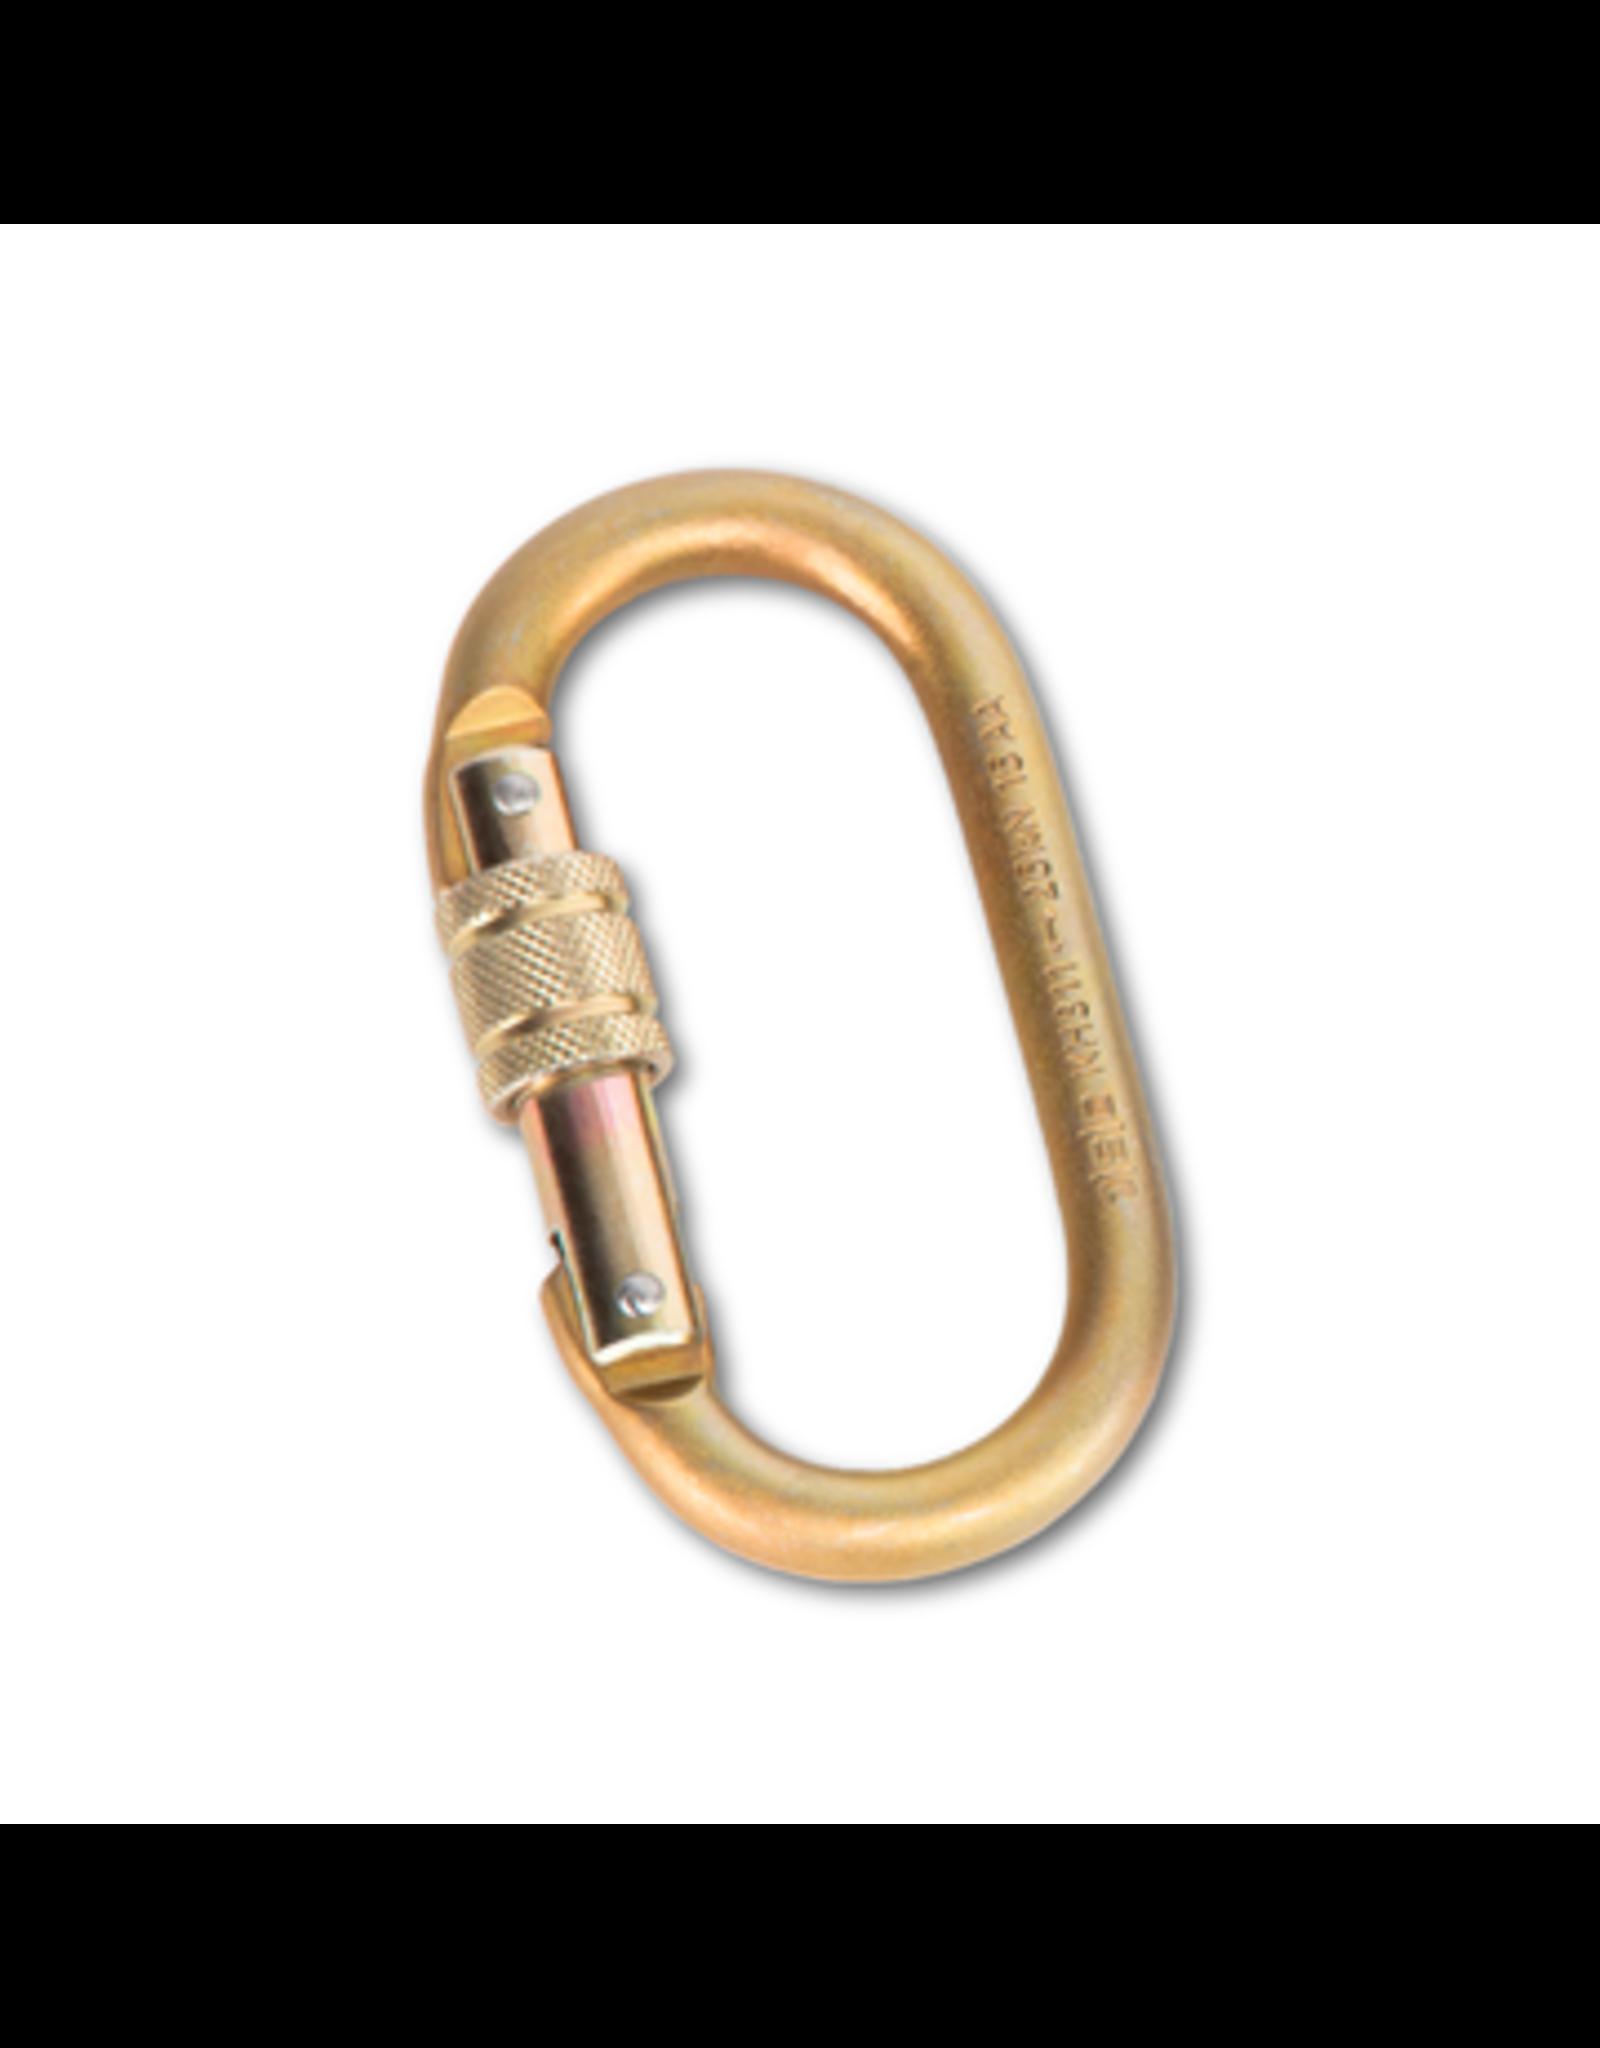 Portable Winch PW STEEL LOCKING CARABINER MBS 25kN